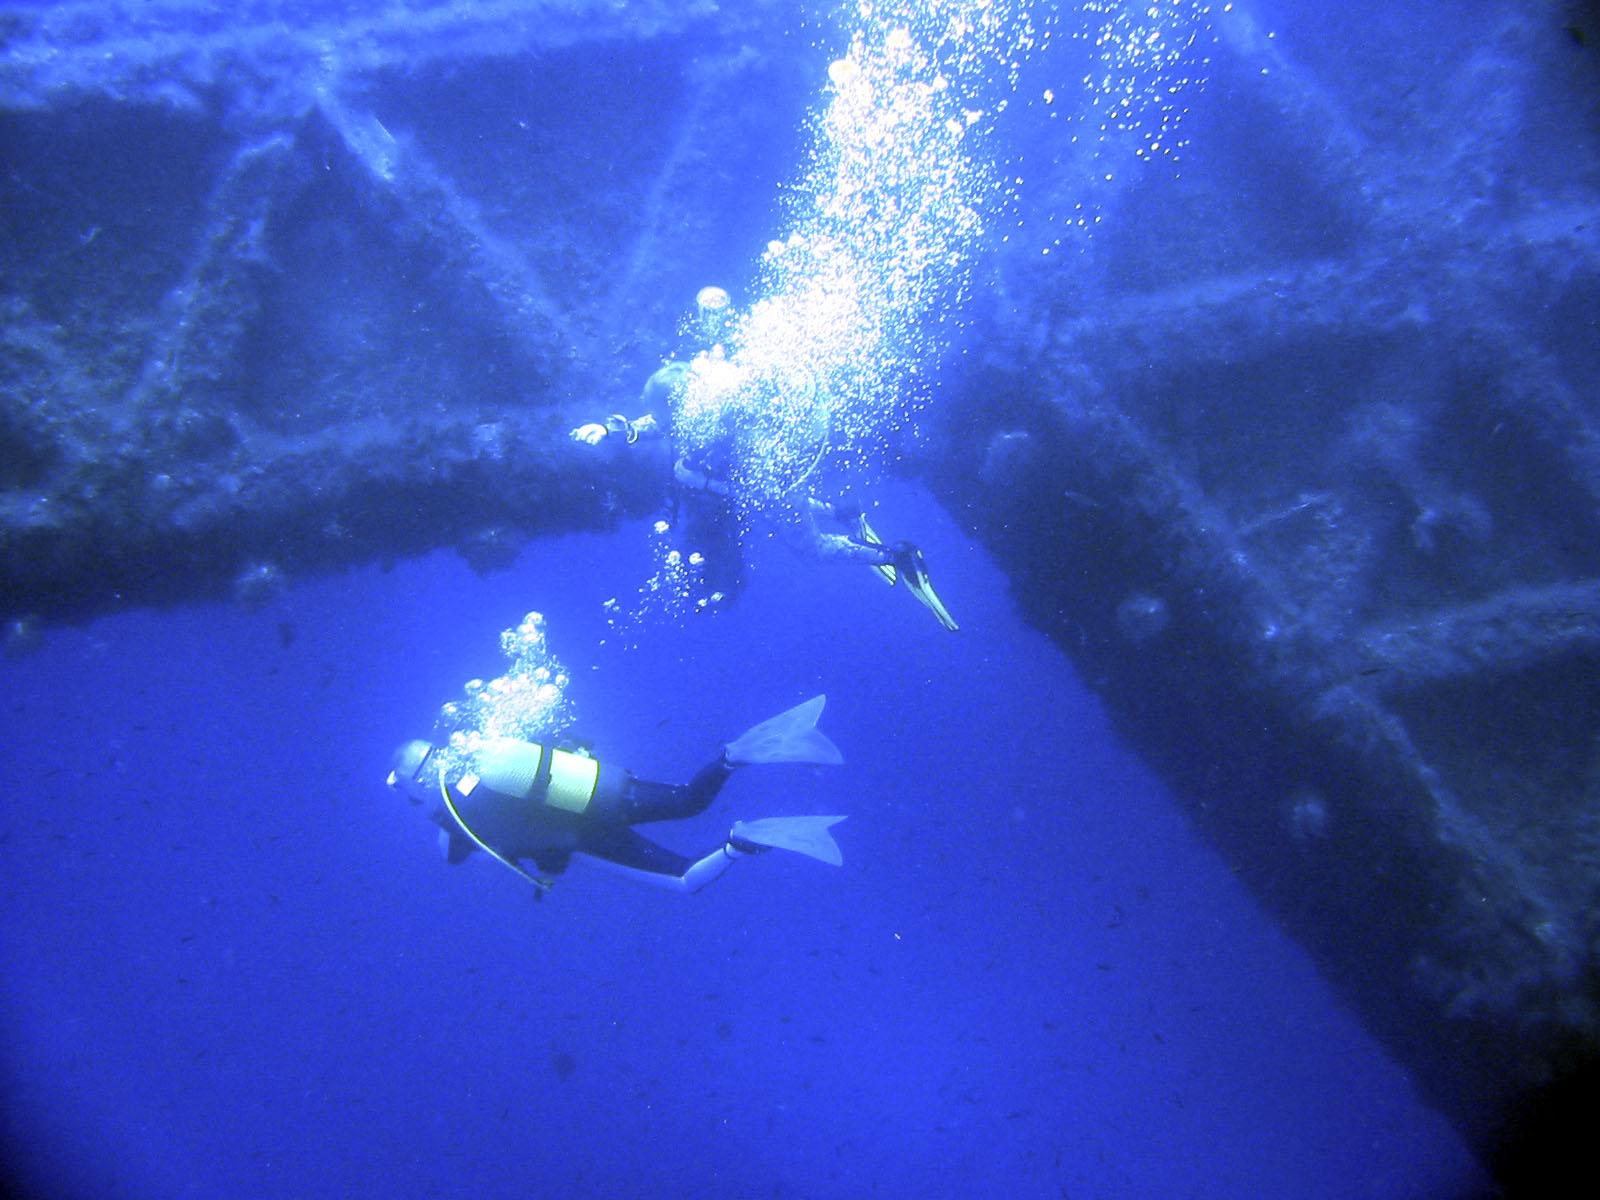 scuba diving wallpaper wallpapers - photo #48